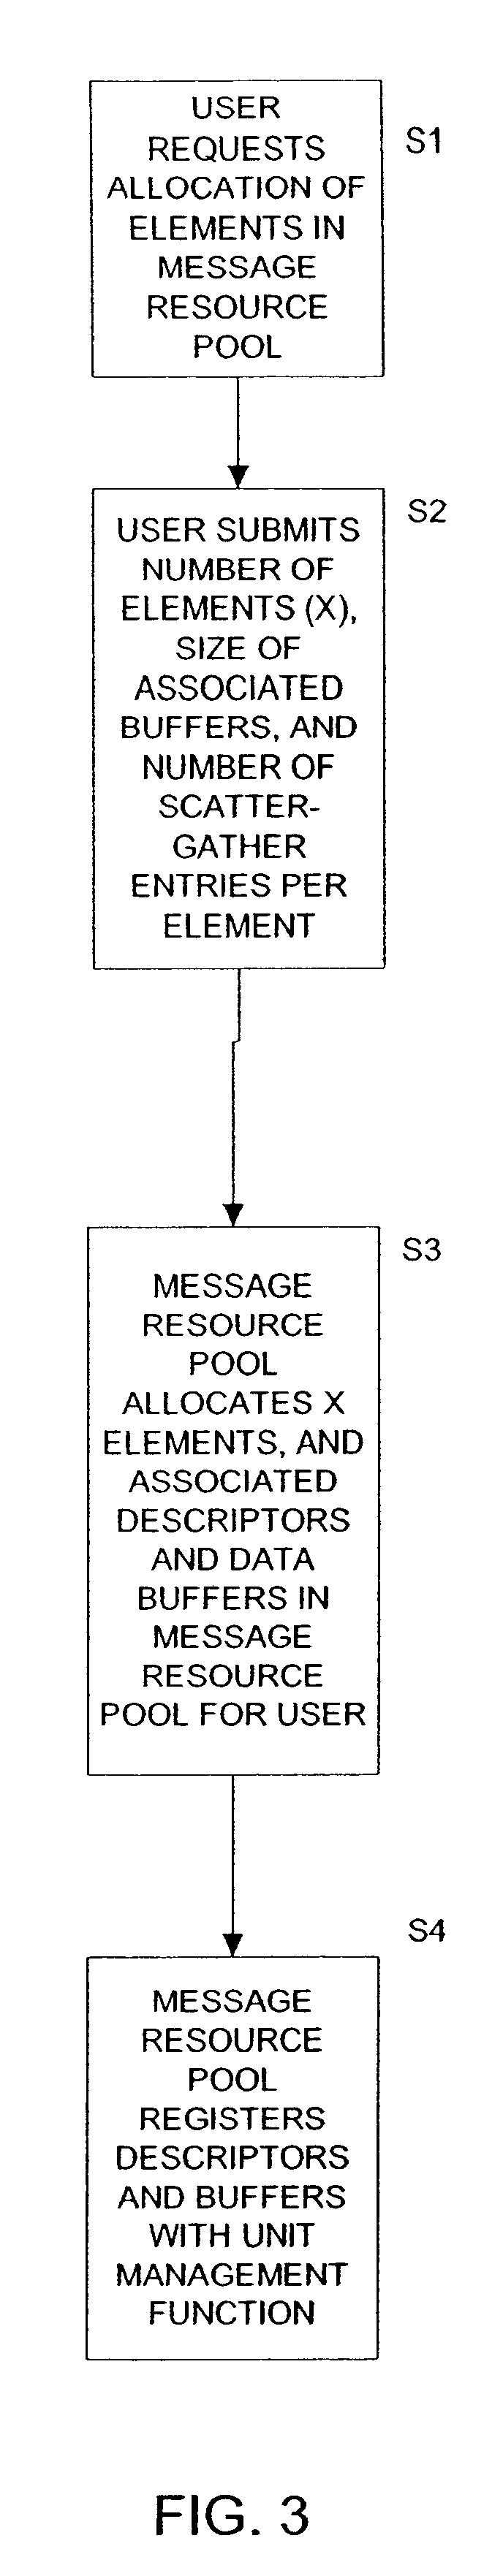 براءة الاختراع US6553438 - Methods and system for message resource